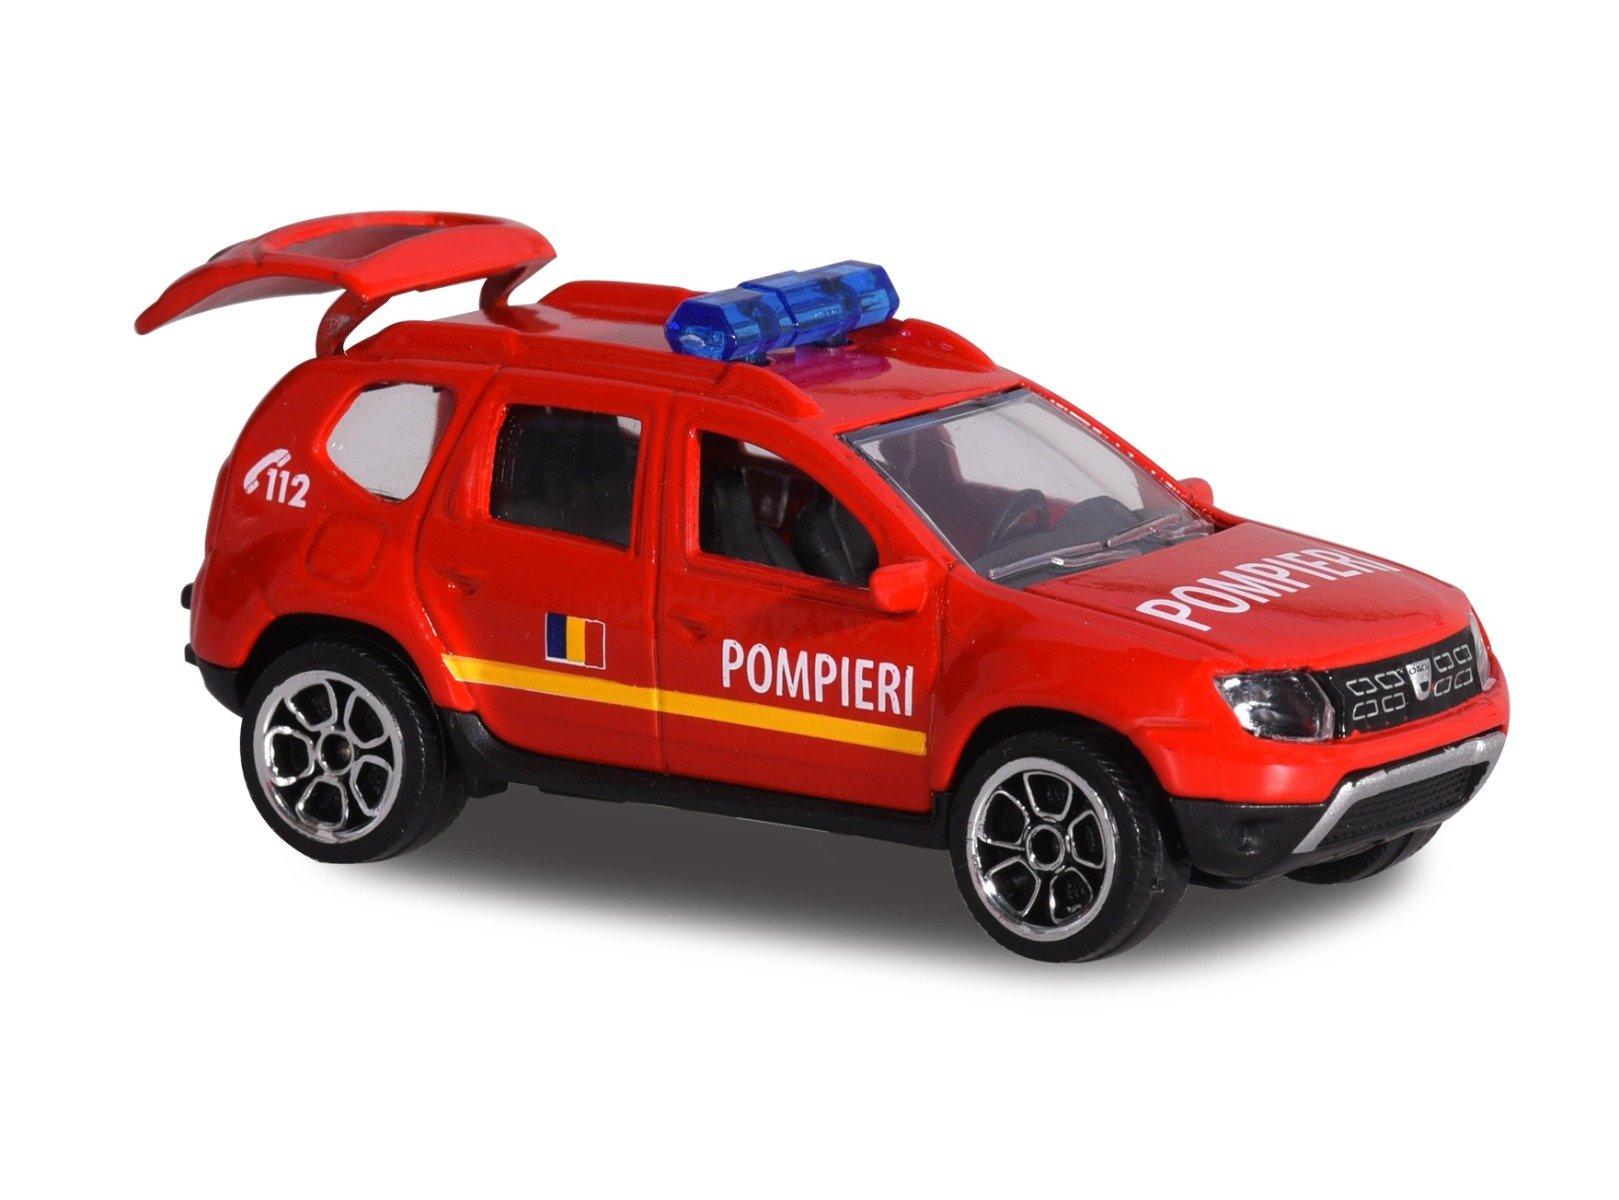 Masinuta Dacia Duster Majorette, 7.5 cm, Pompieri